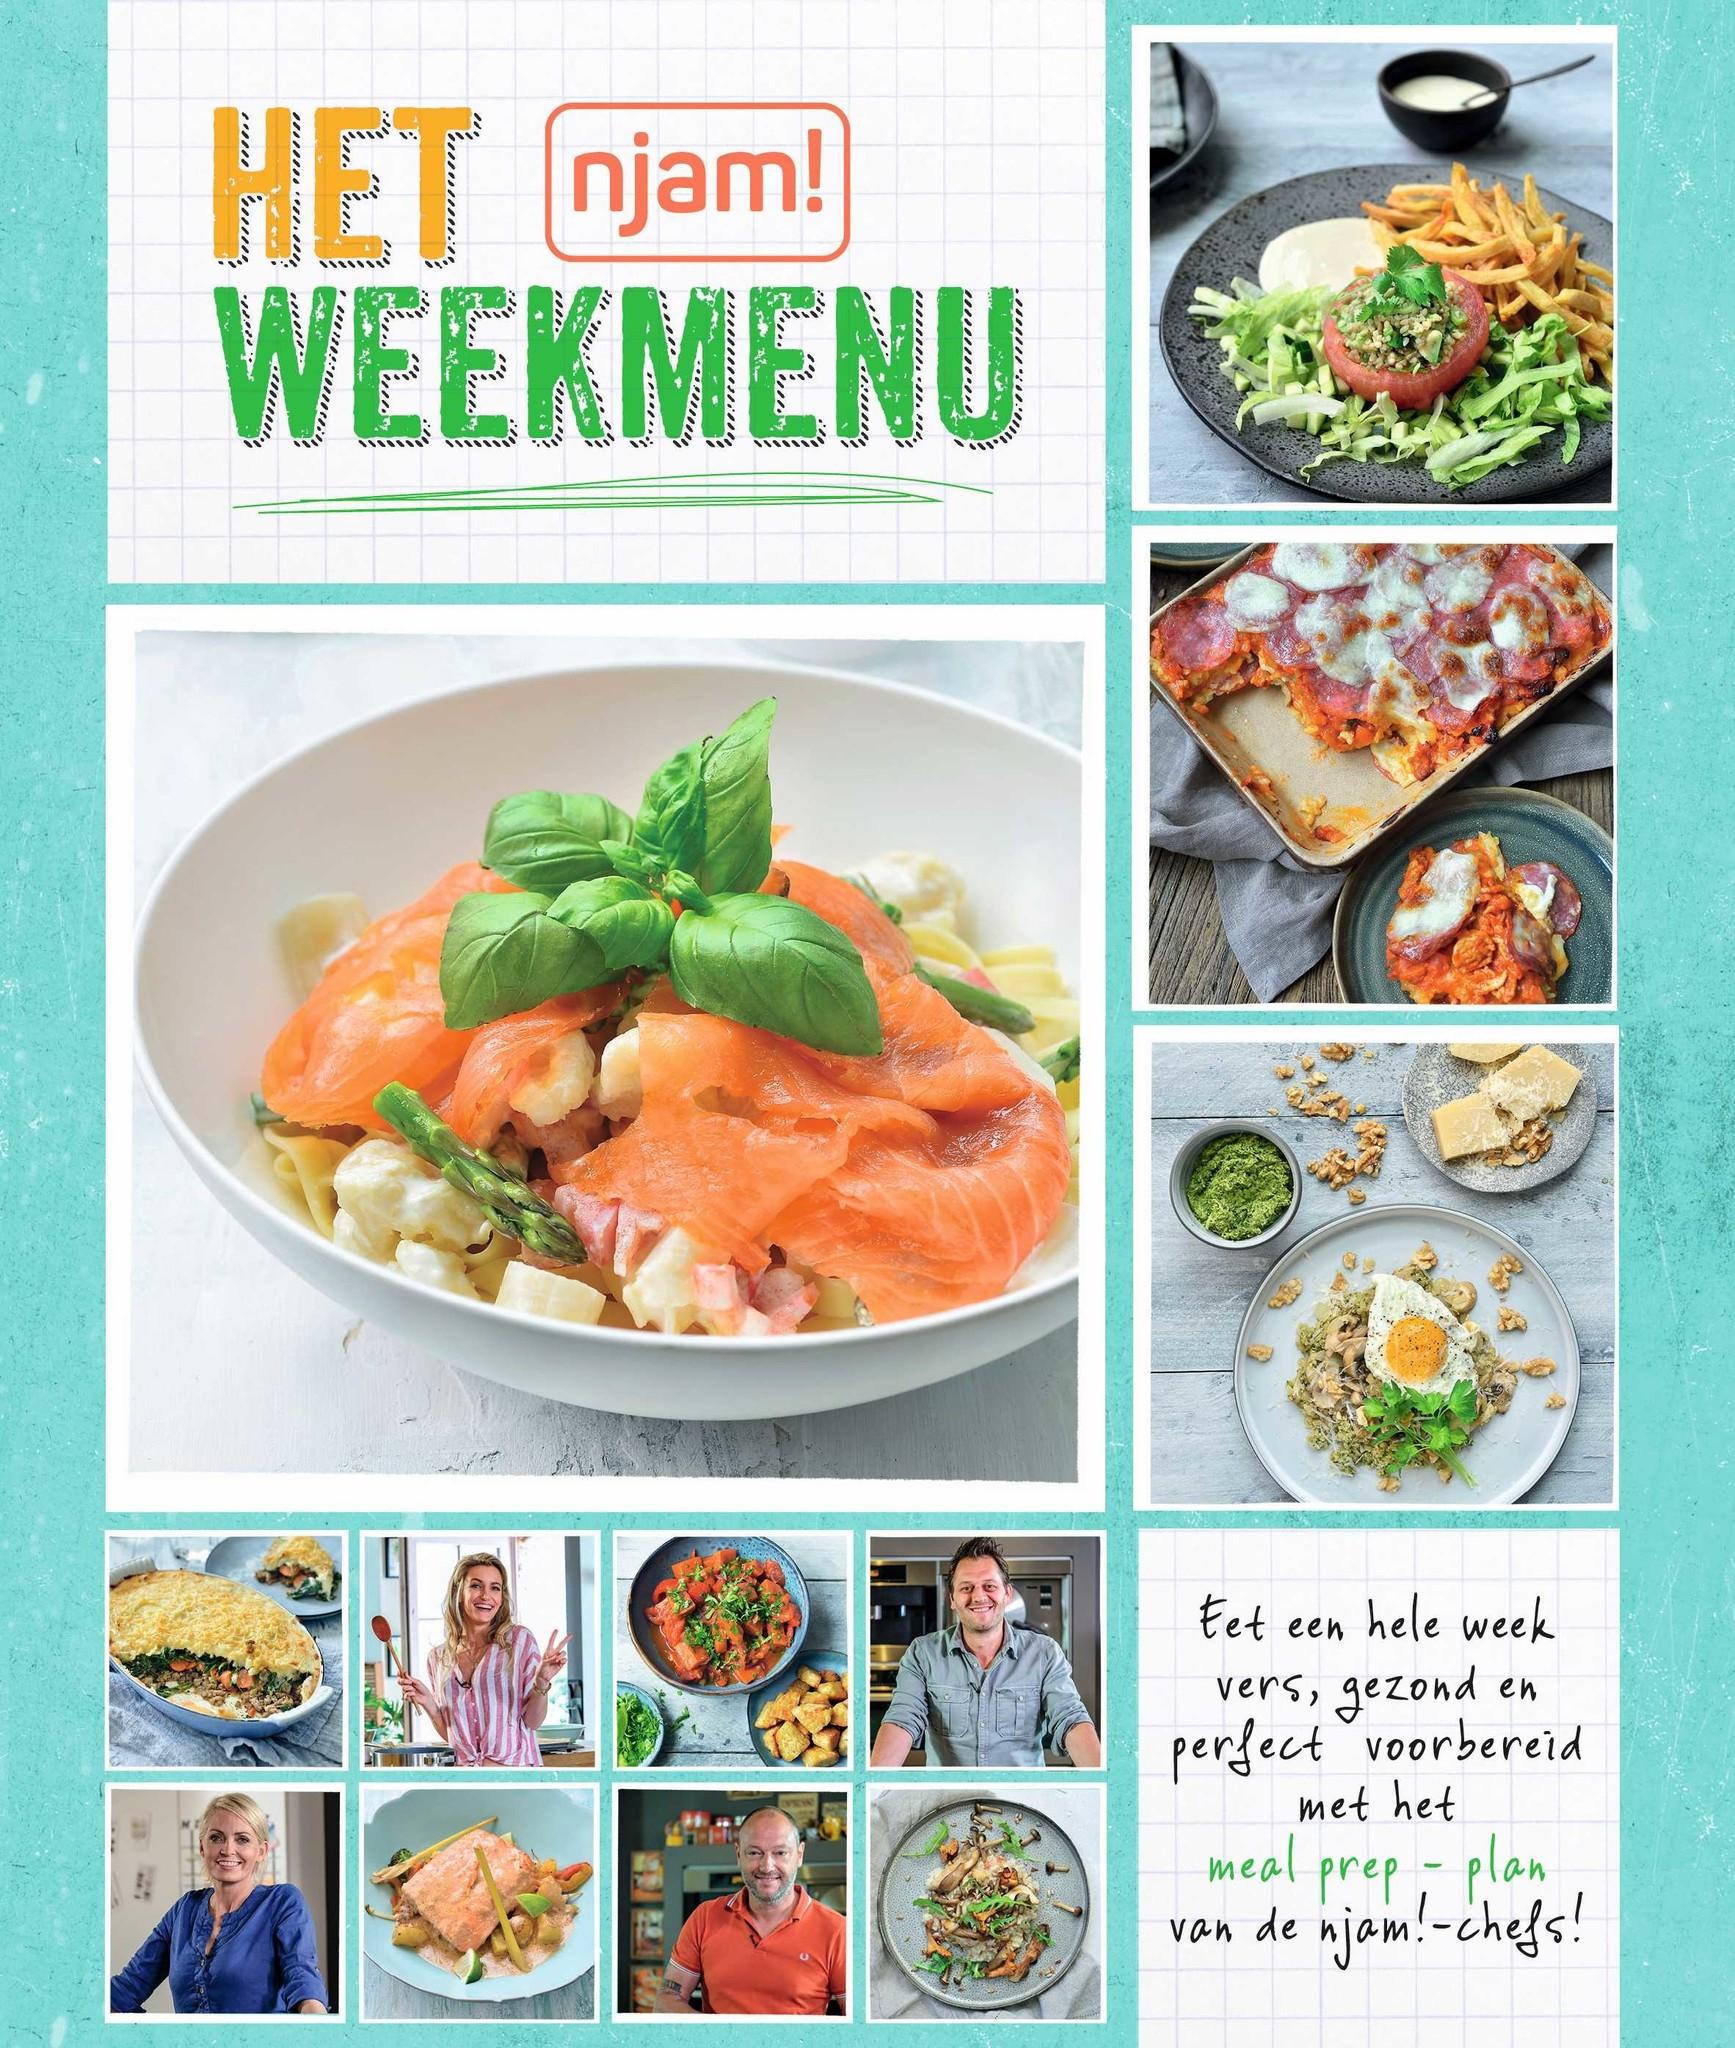 Livre Njam : Le menu de la semaine